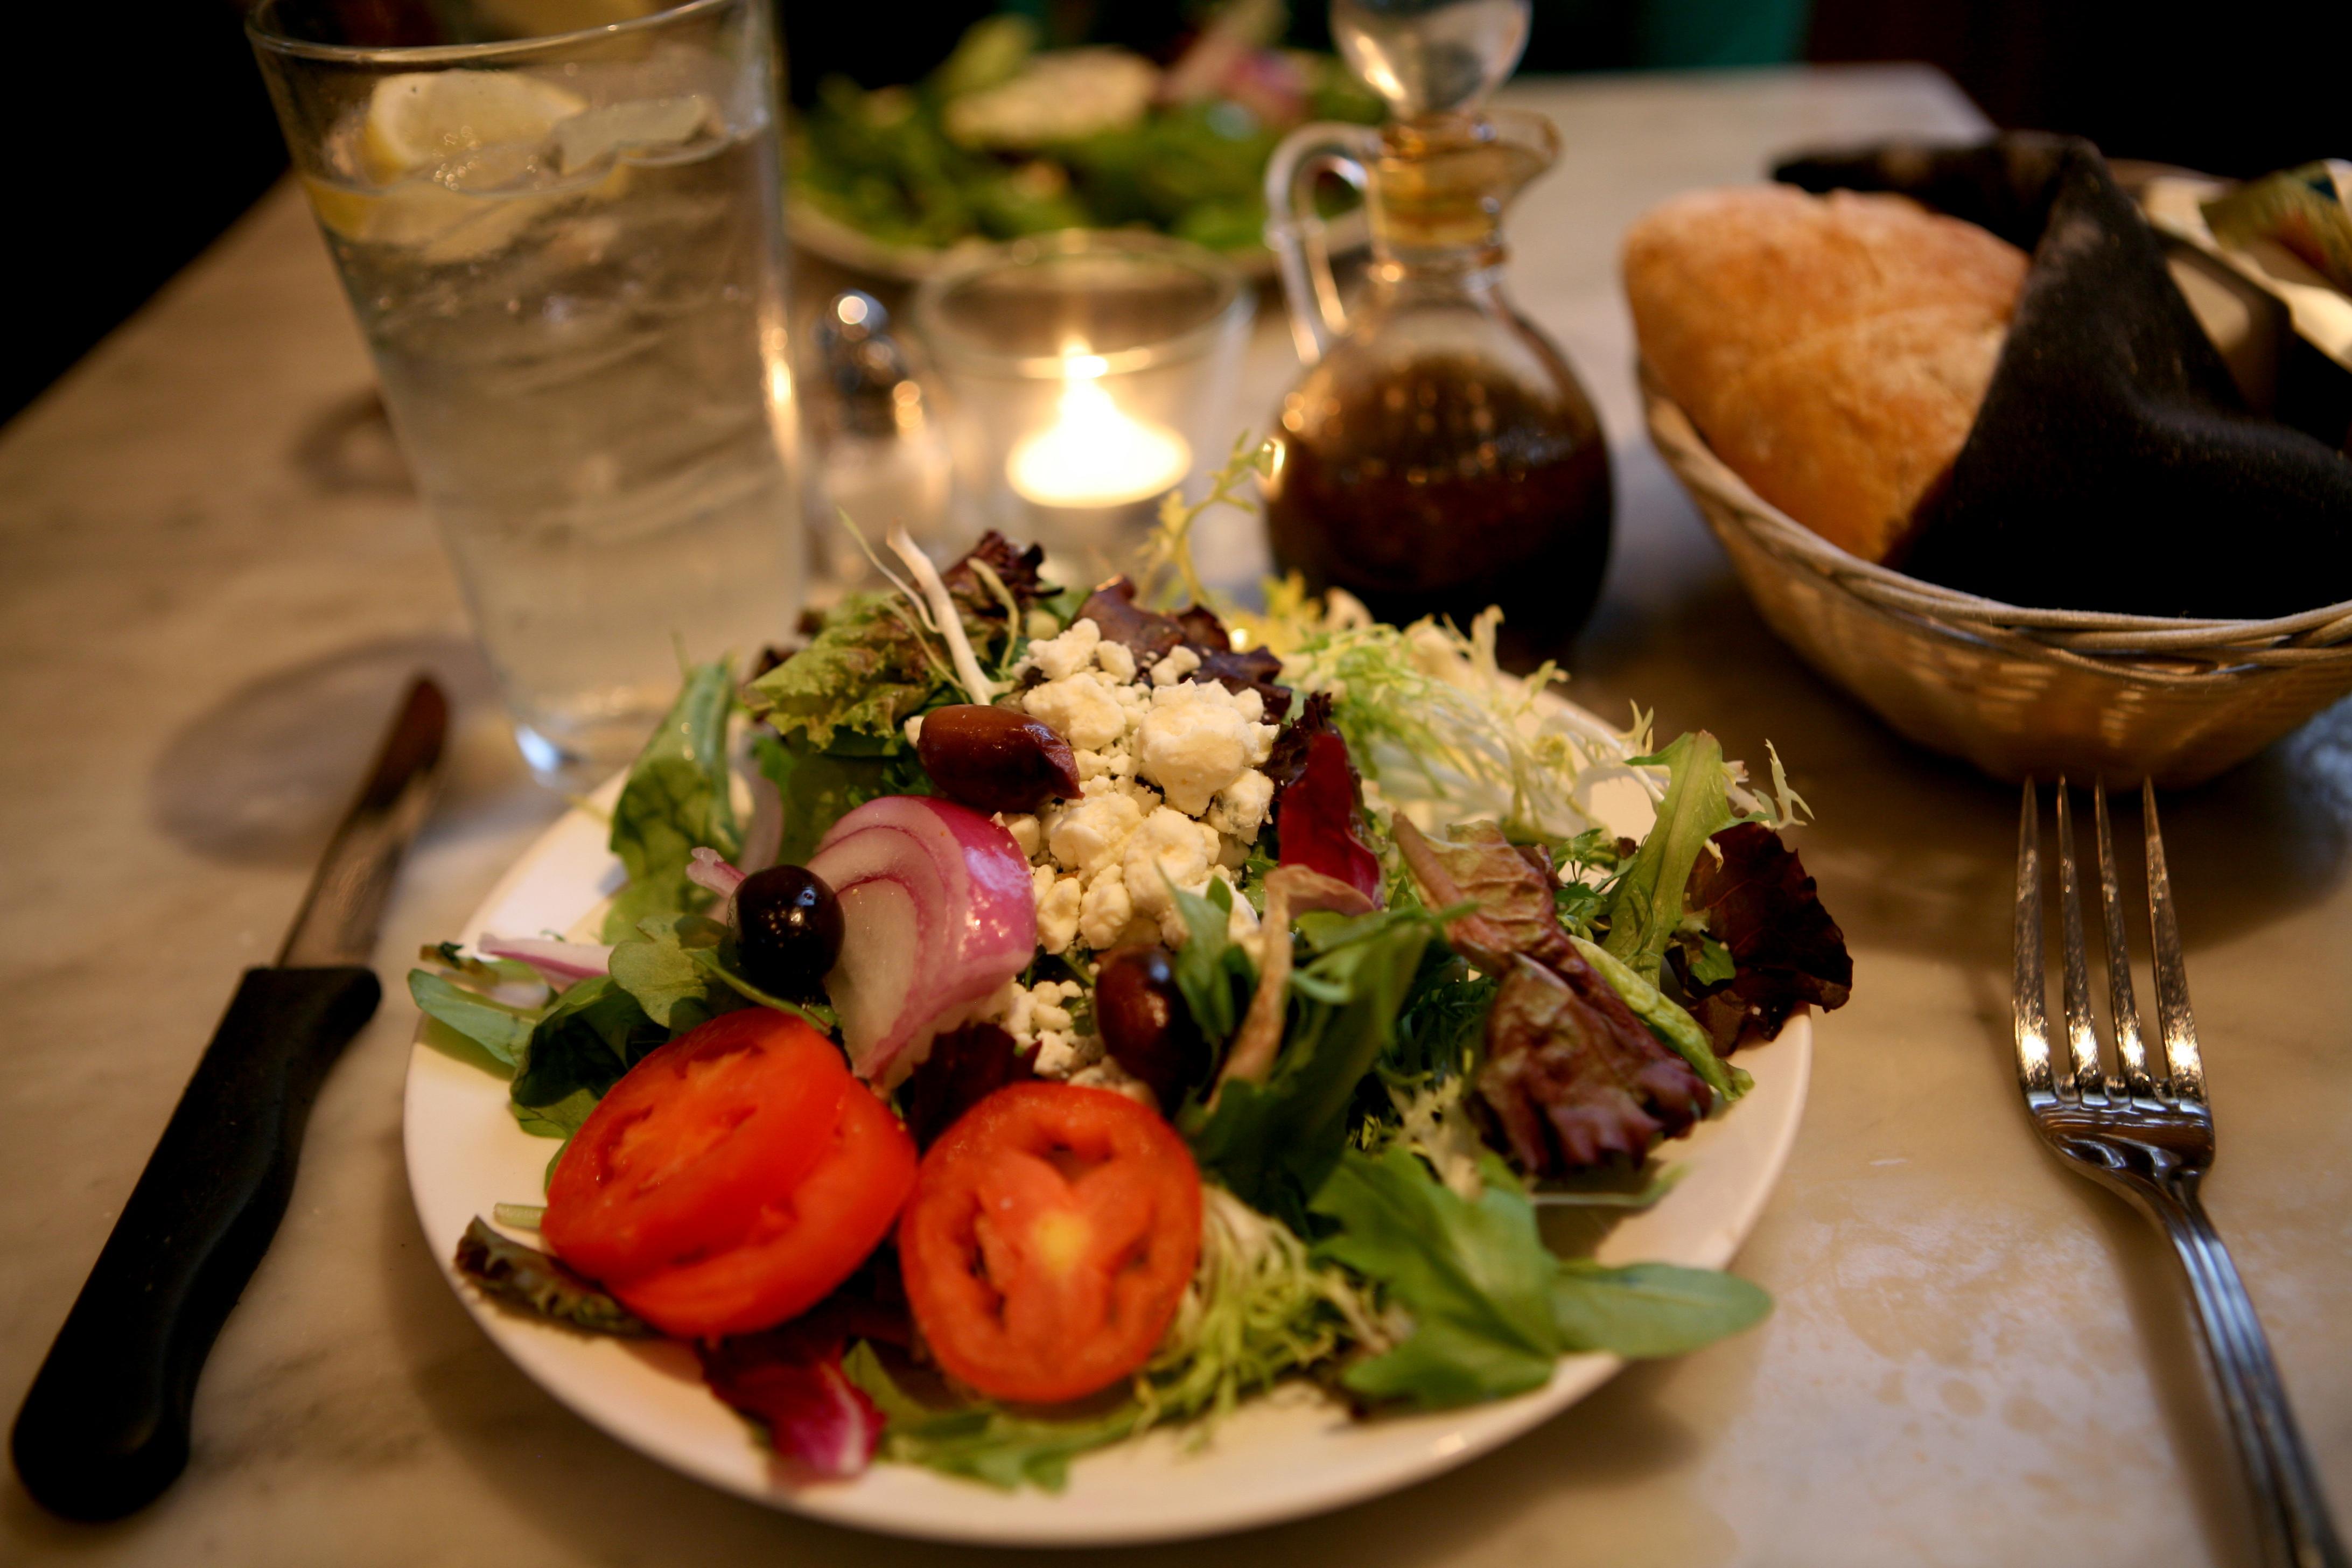 Good Neighborhood Italian Restaurant In Tamarac Or Coral Springs Fl